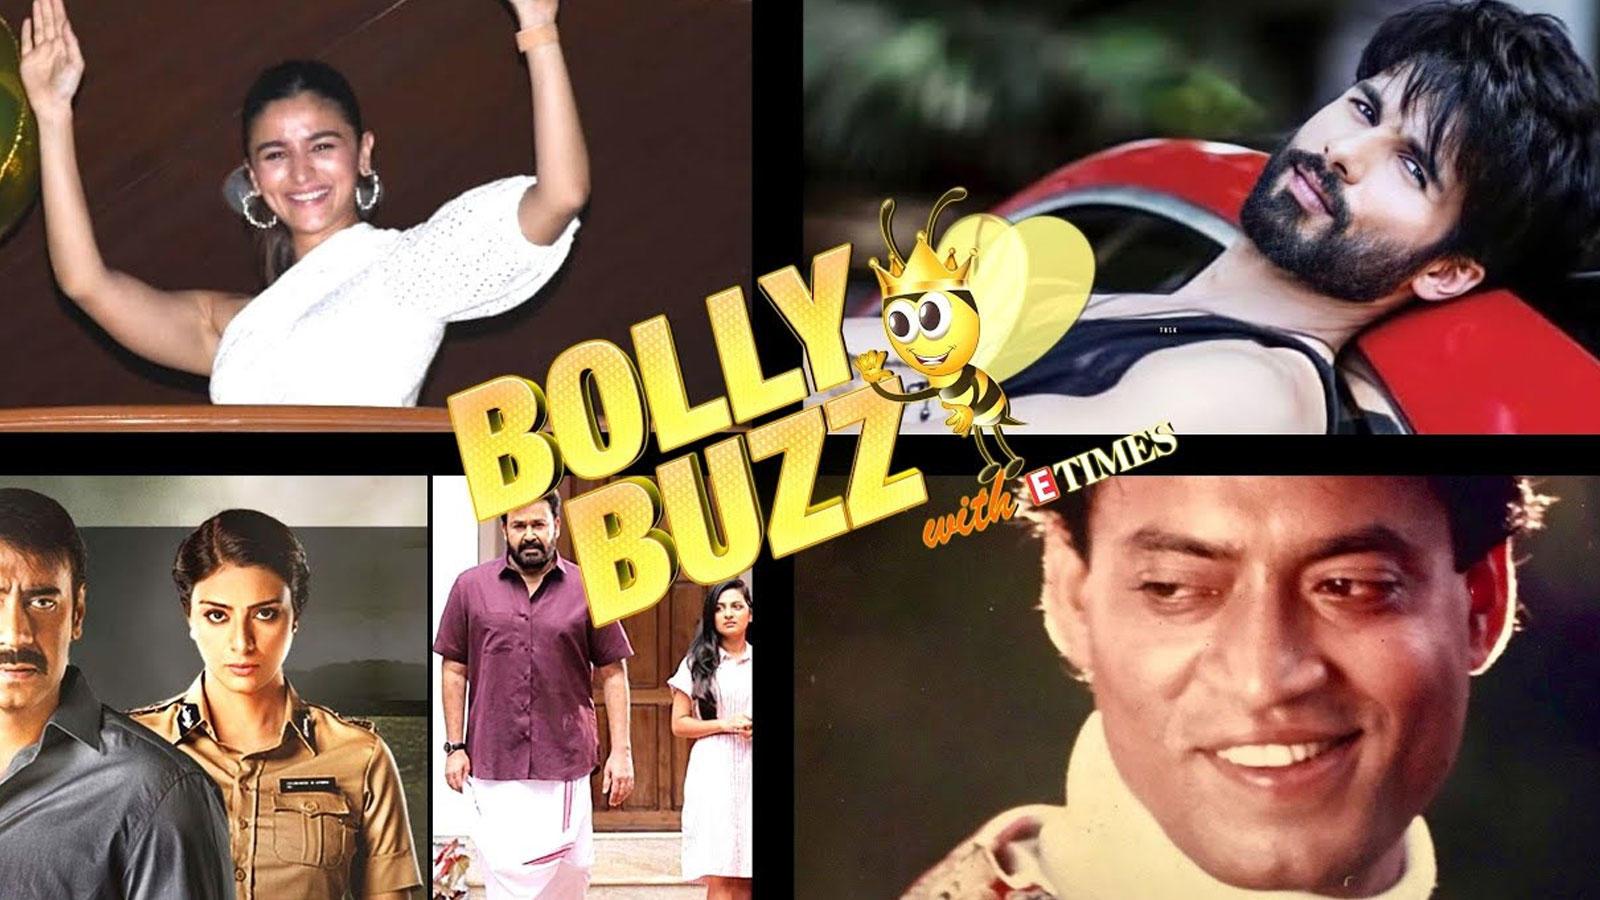 bolly-buzz-alia-bhatt-winning-hearts-ajay-devgn-set-for-drishyam-2-bday-wishes-for-shahid-kapoor